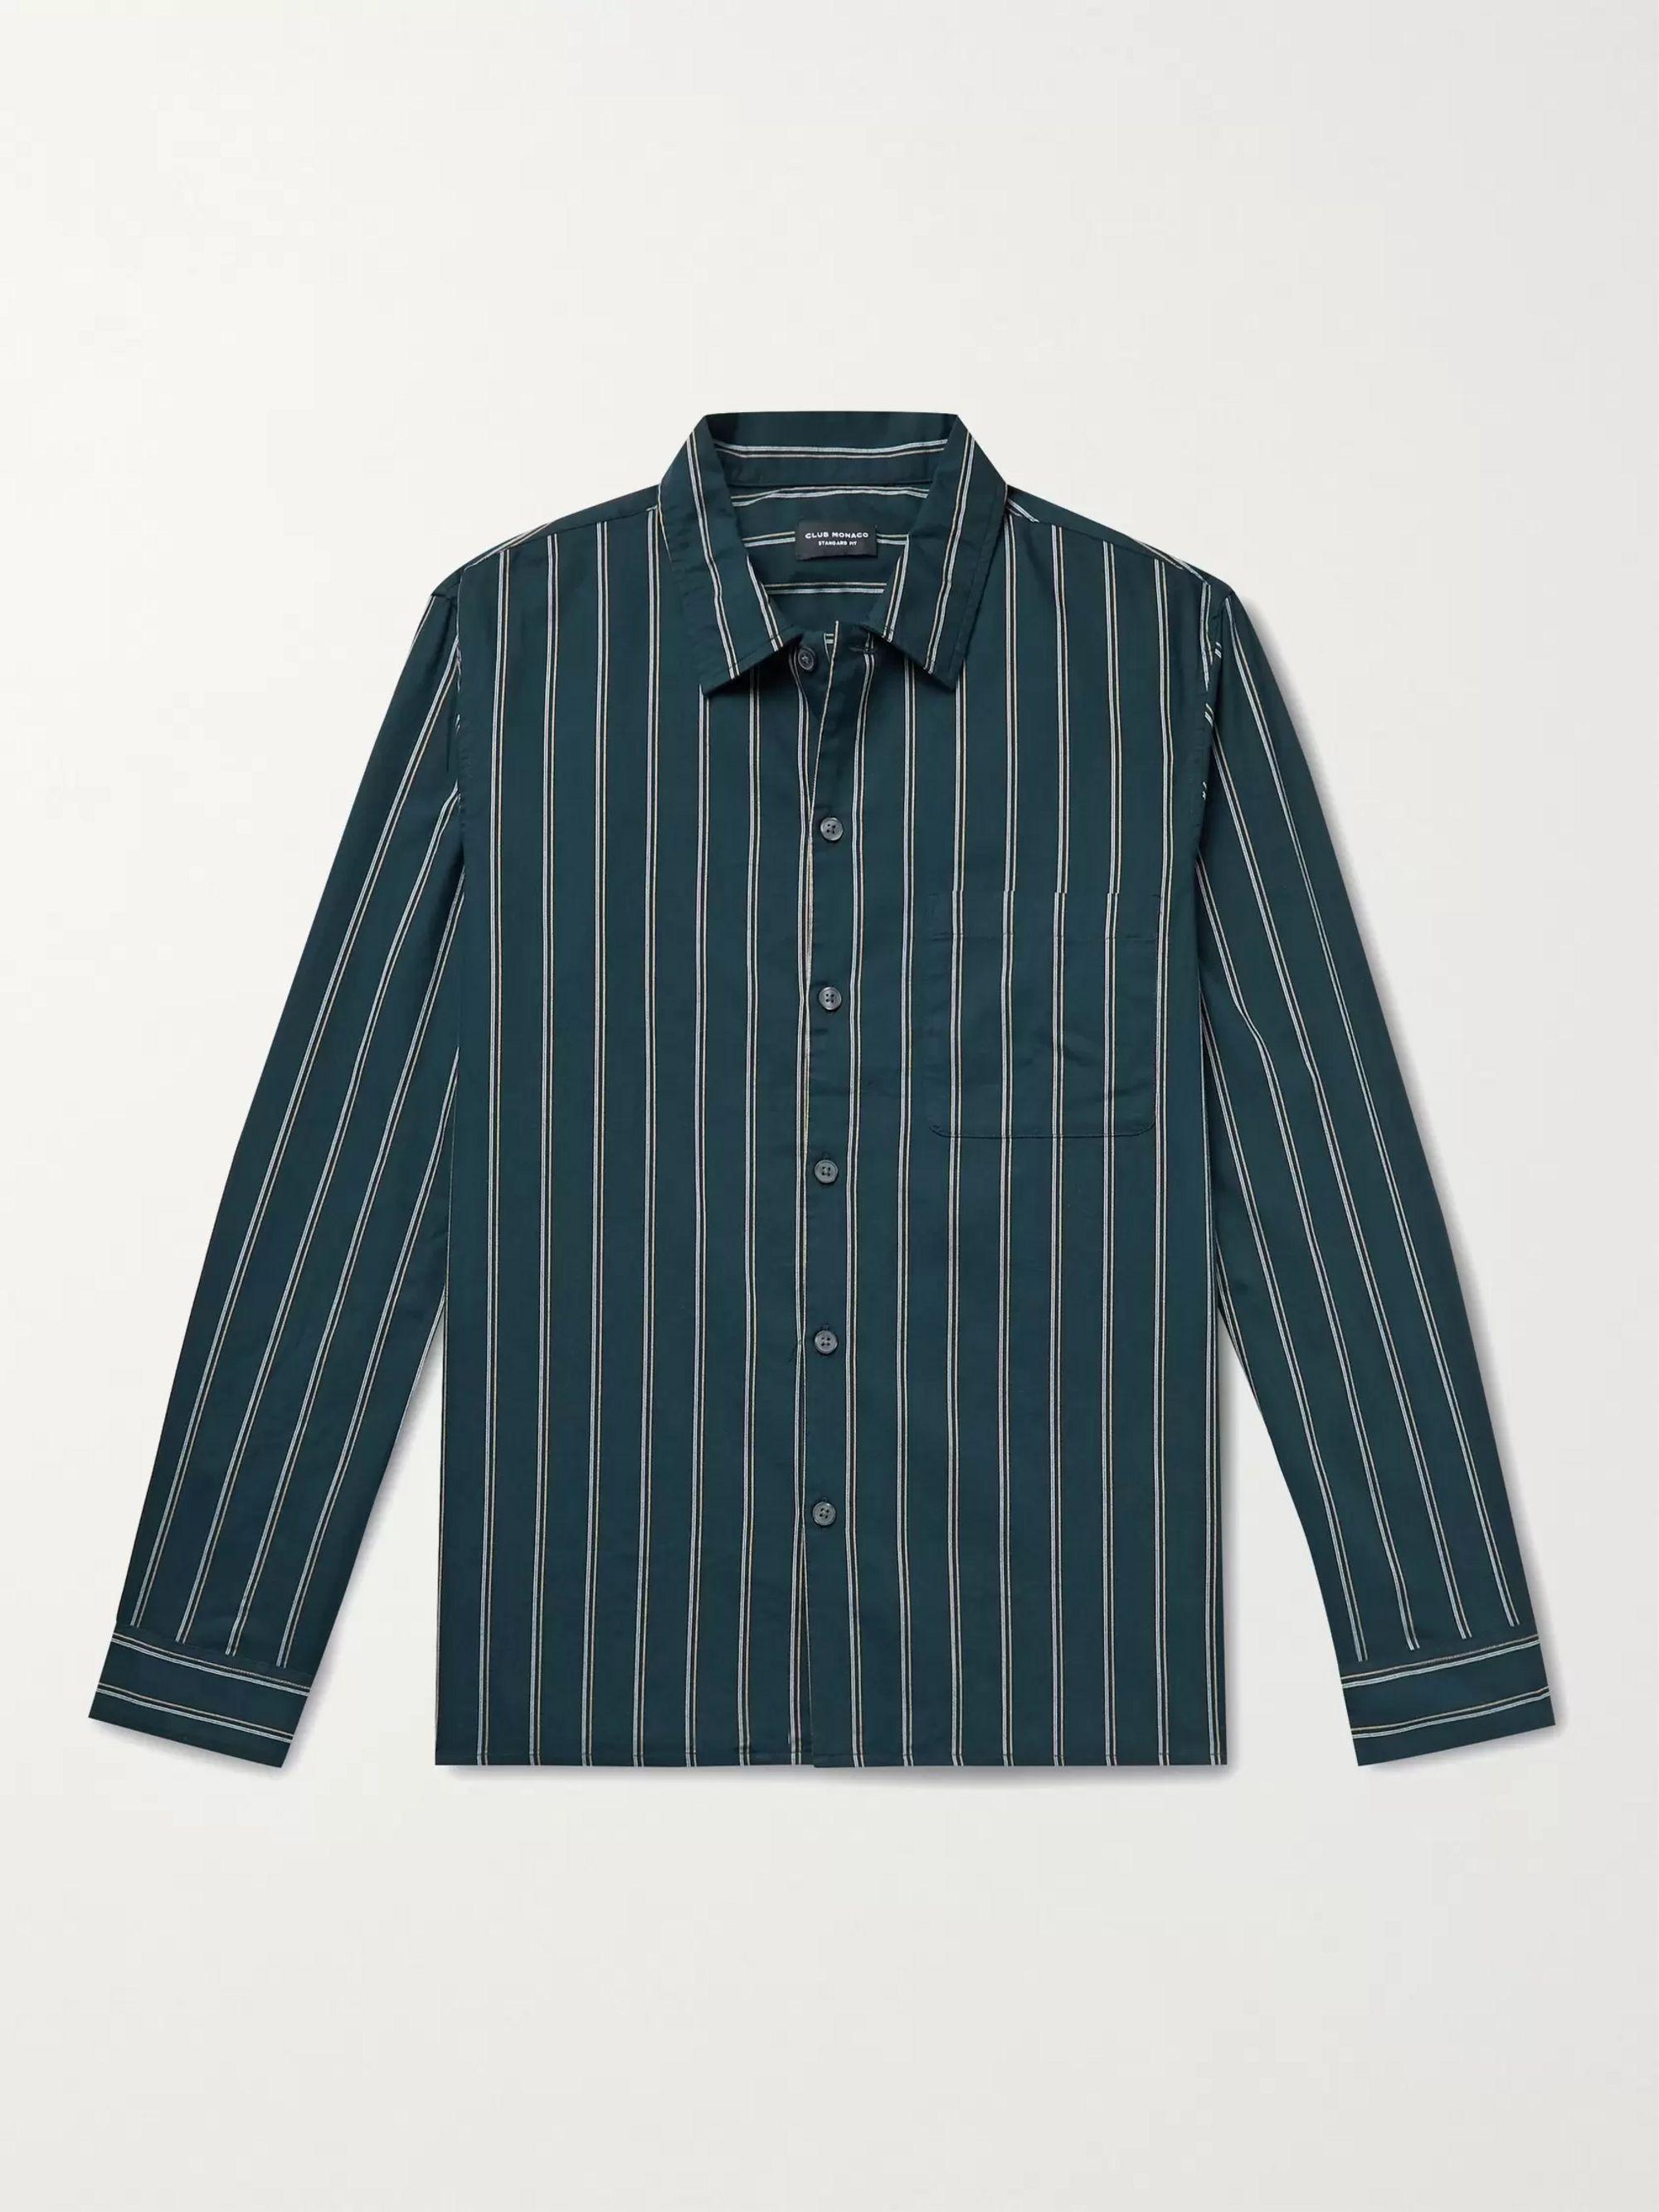 CLUB MONACO Striped Cotton Oxford Shirt